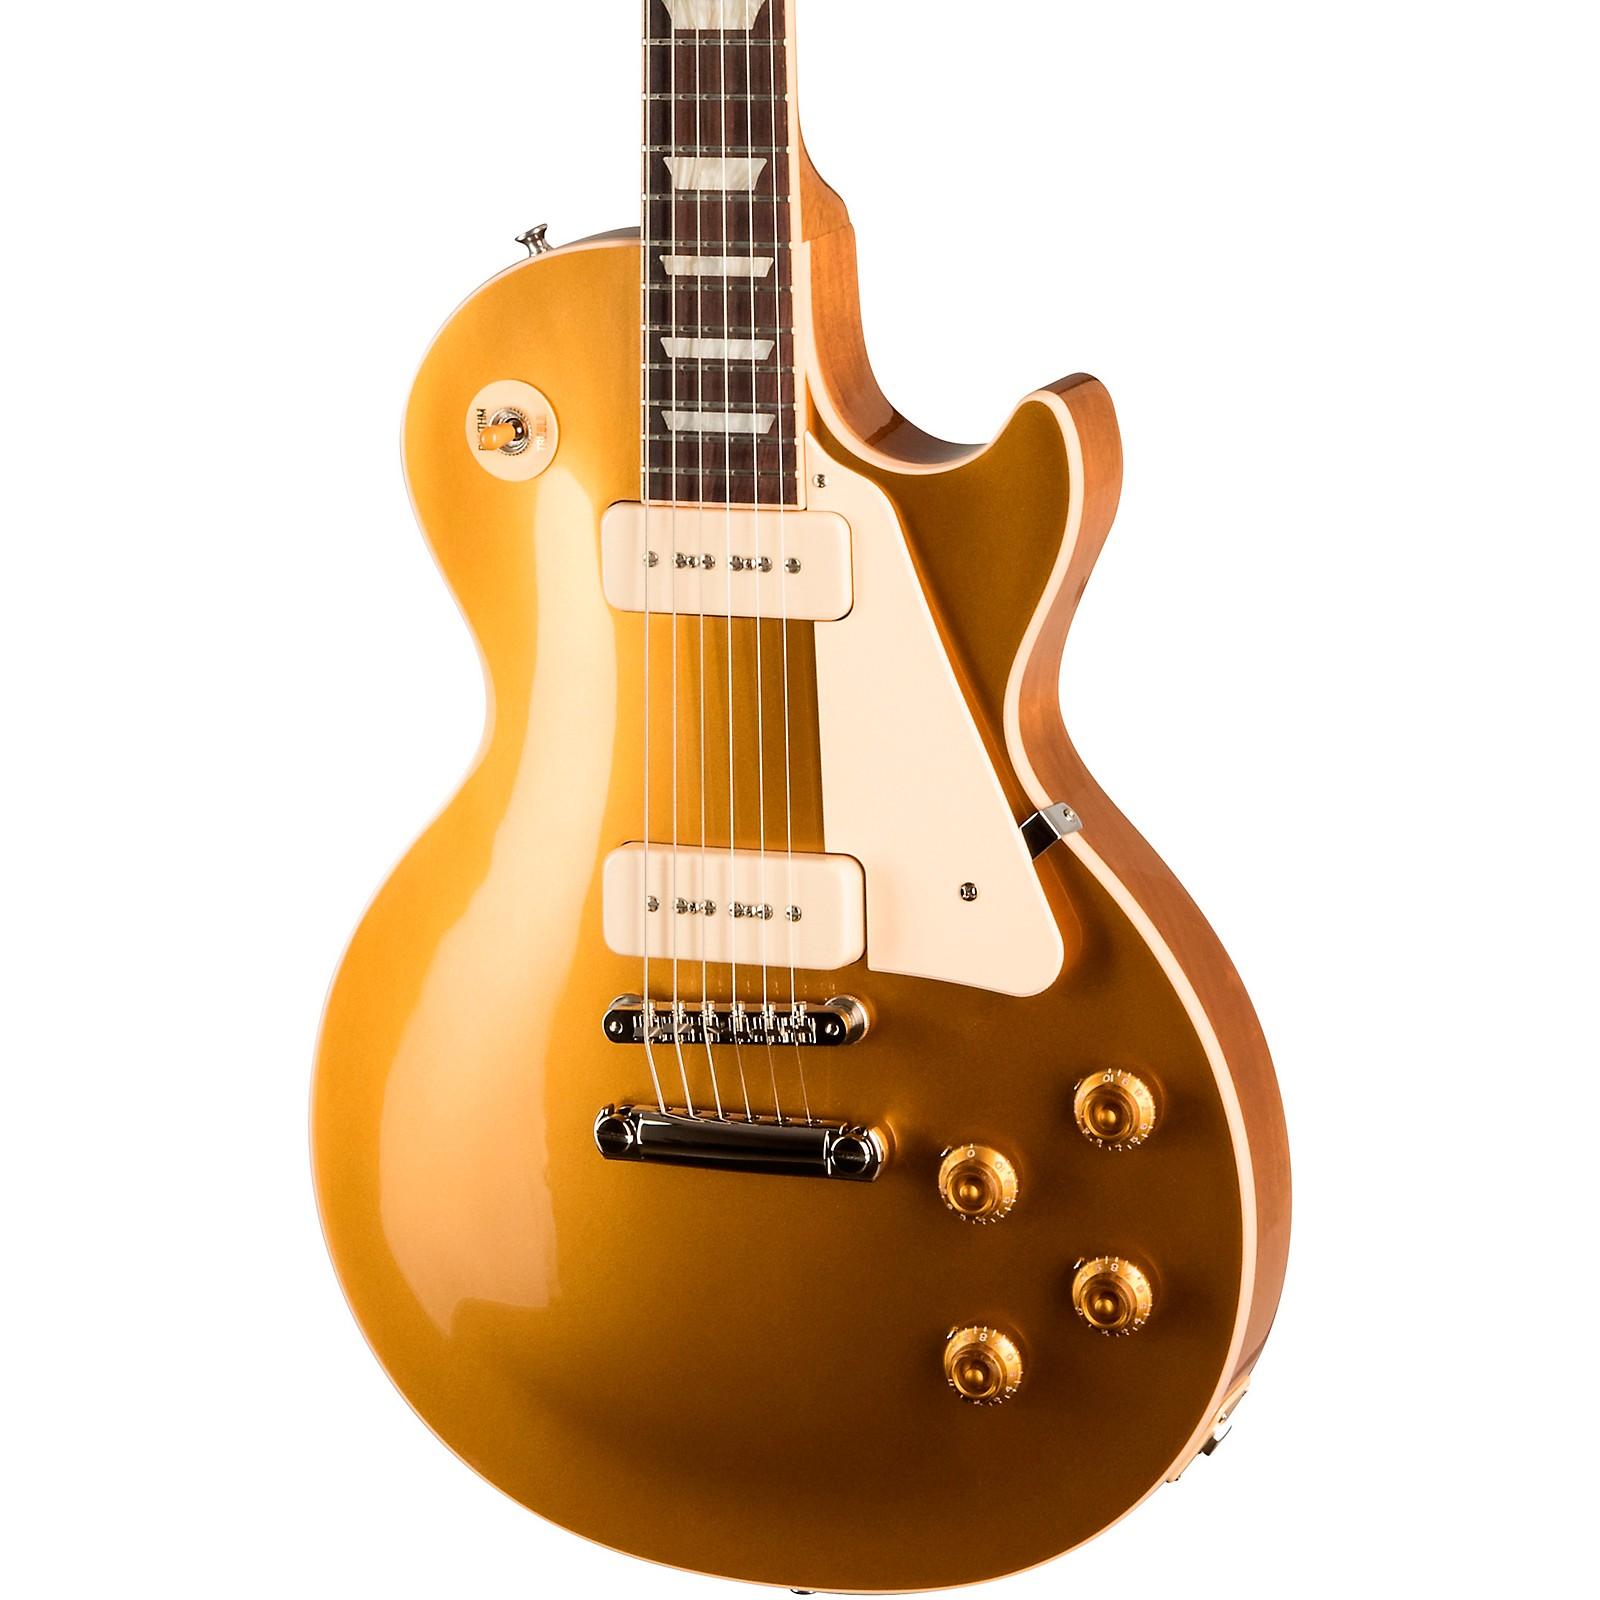 Gibson Les Paul Standard '50s P-90 Electric Guitar